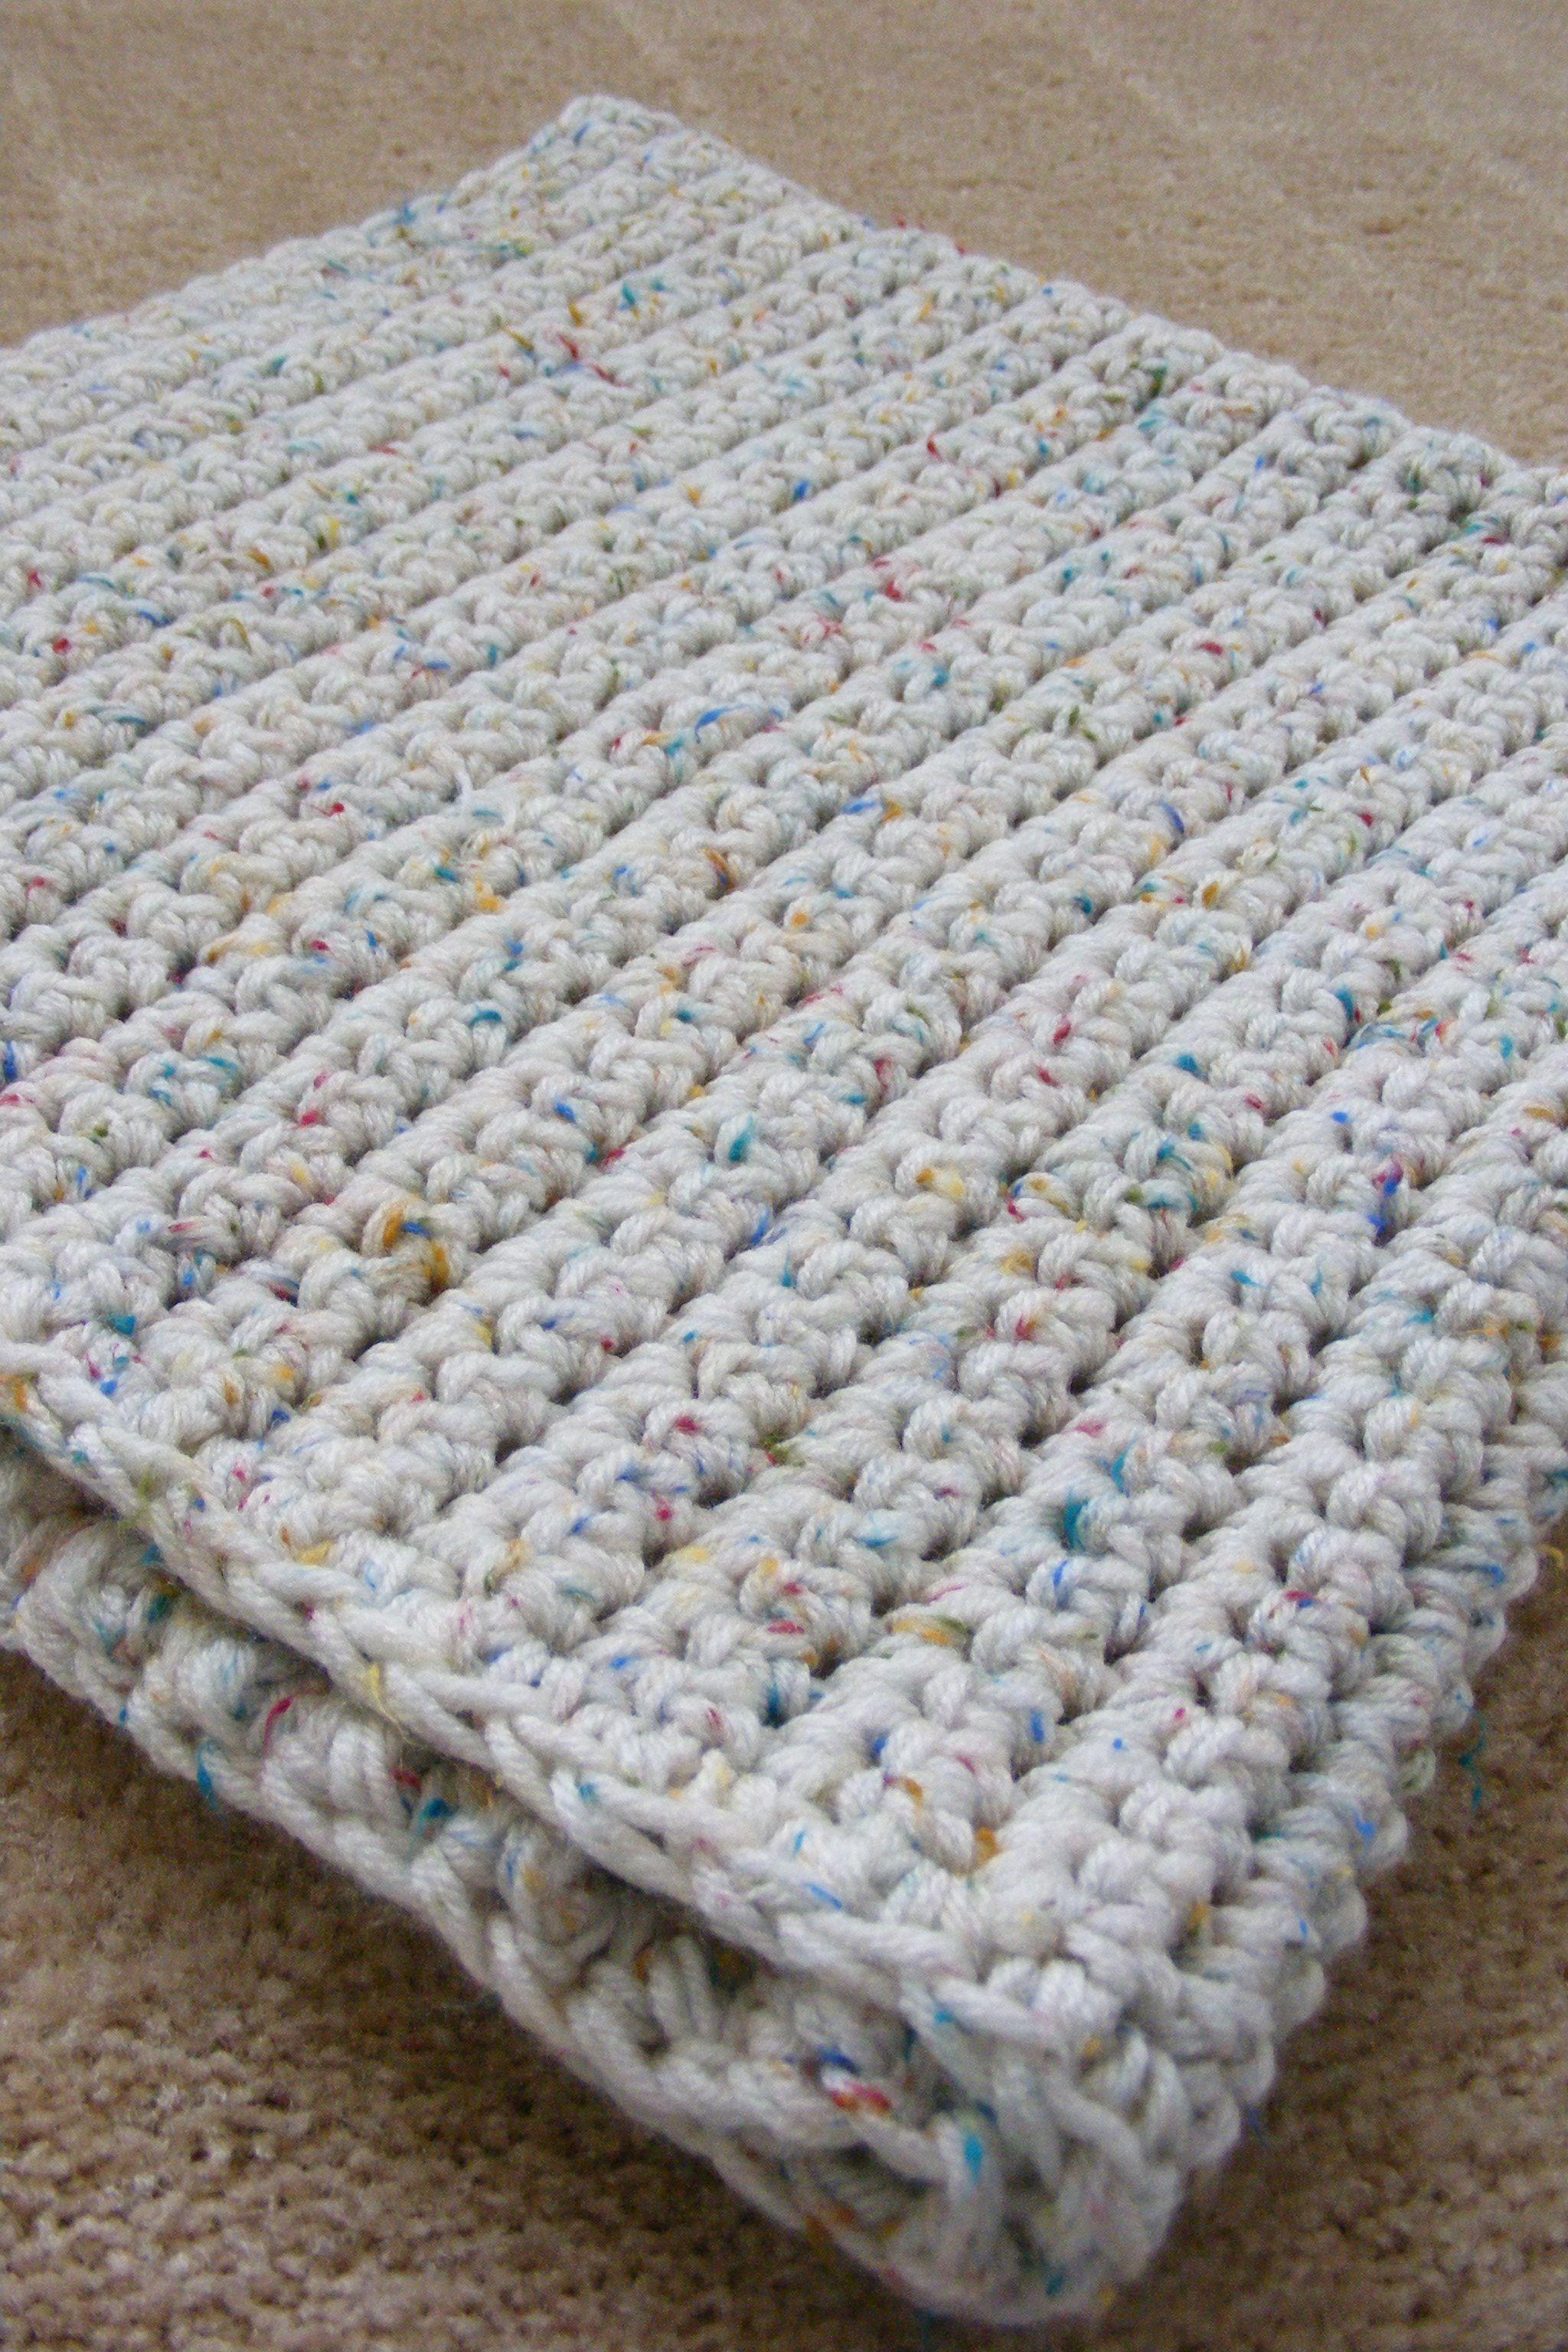 Single crochet baby blanket pattern single crochet crochet baby free crochet baby blanket patterns single crochet baby blanket pattern gretchkals yarny adventures bankloansurffo Images